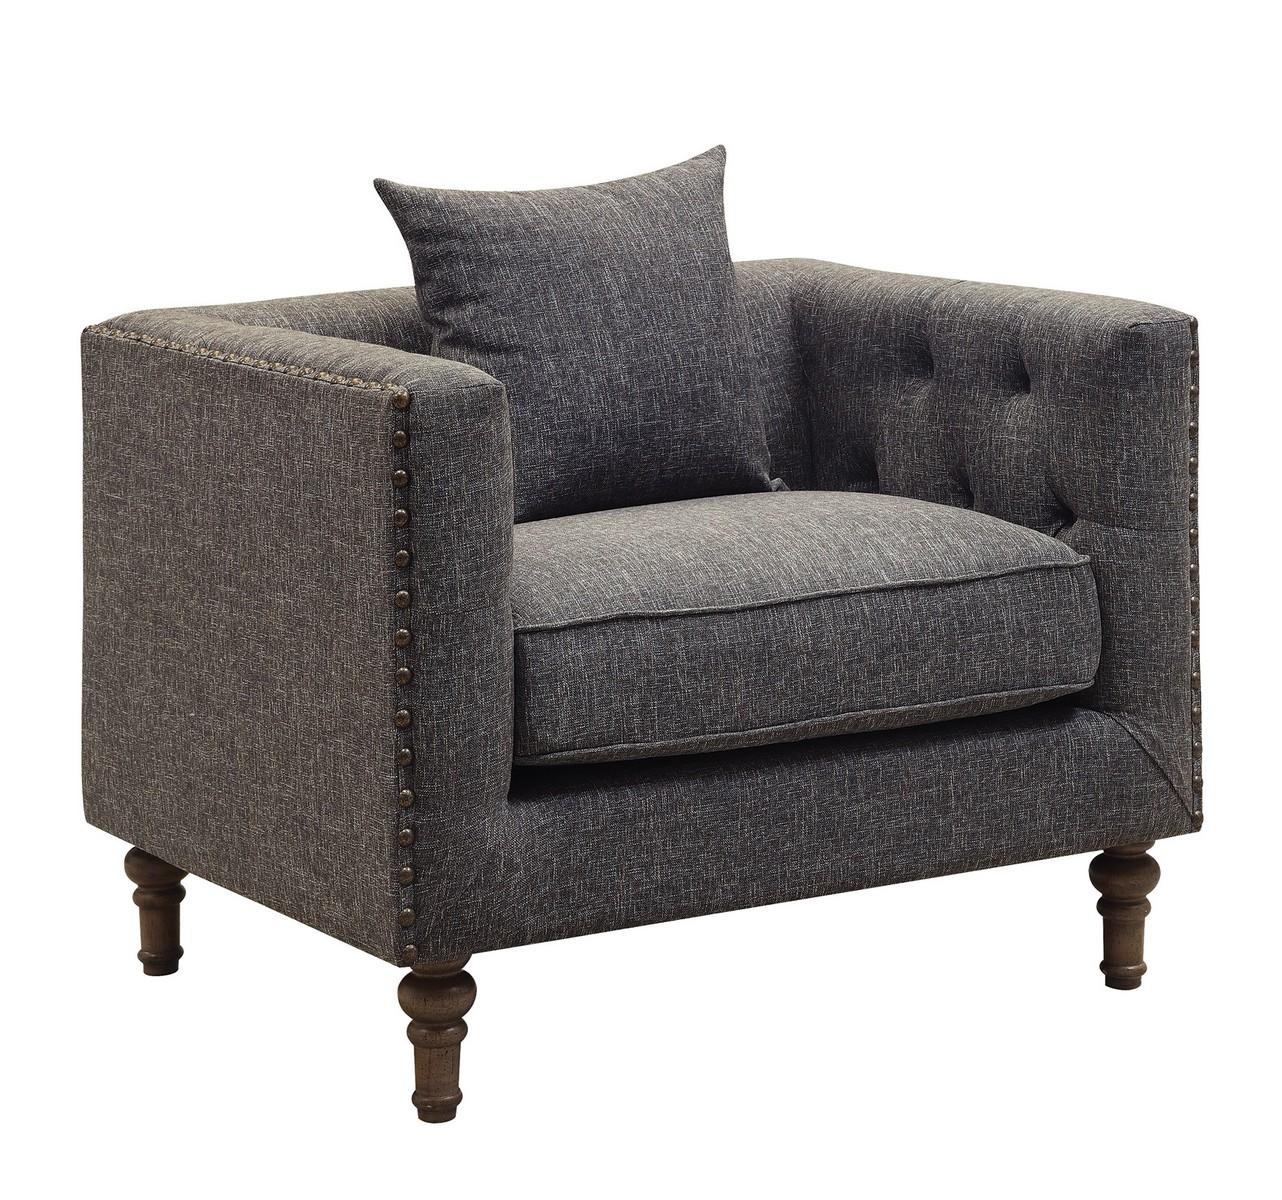 Coaster Ellery Chair - Grey